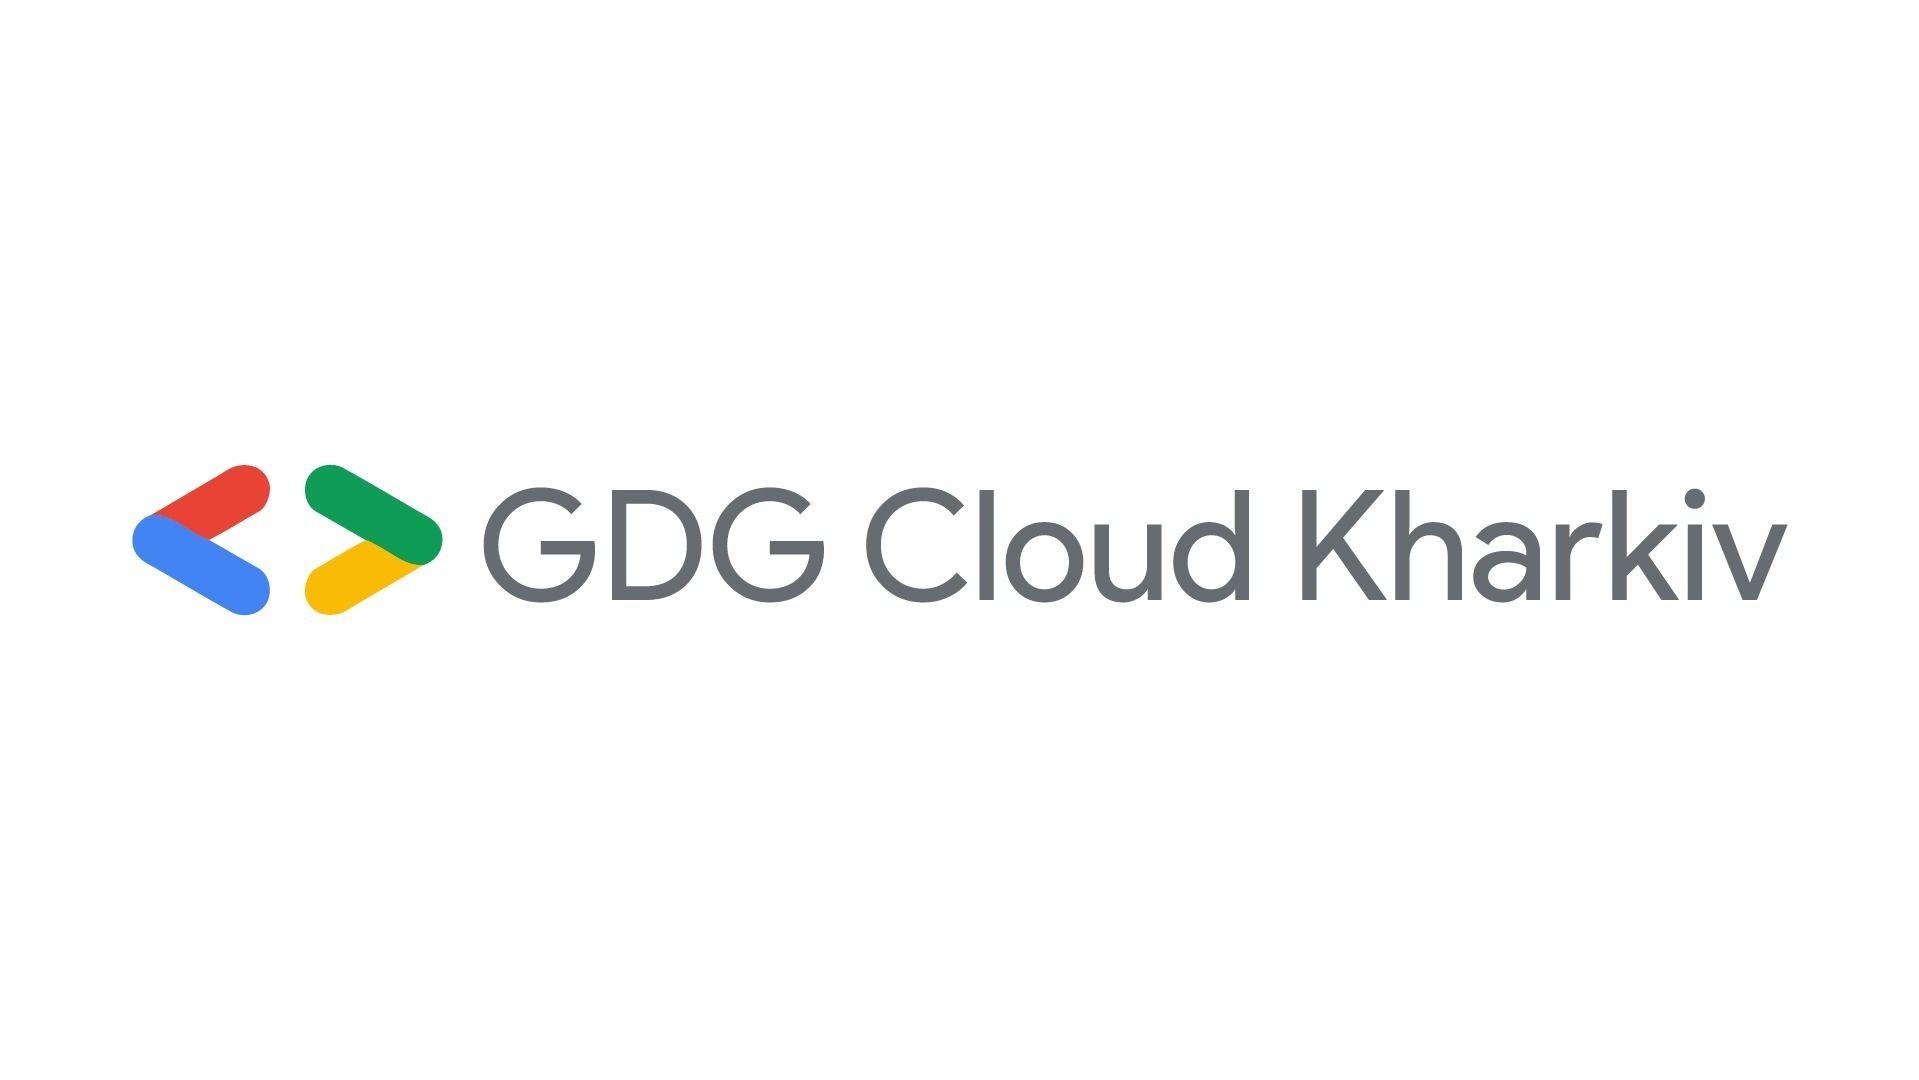 GDG Cloud Kharkiv